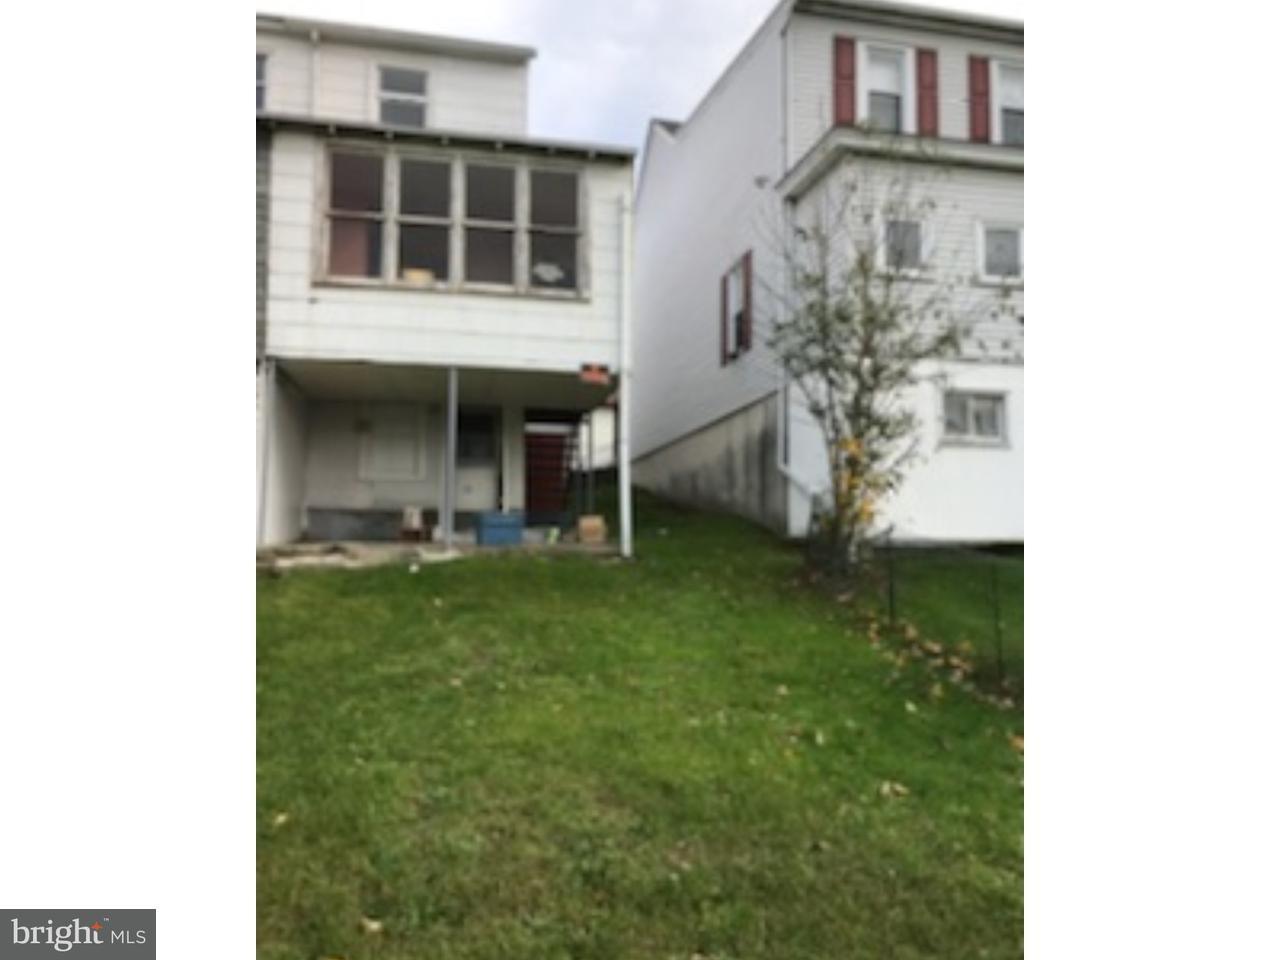 Casa unifamiliar adosada (Townhouse) por un Venta en 553 3RD Street Port Carbon, Pennsylvania 17965 Estados Unidos